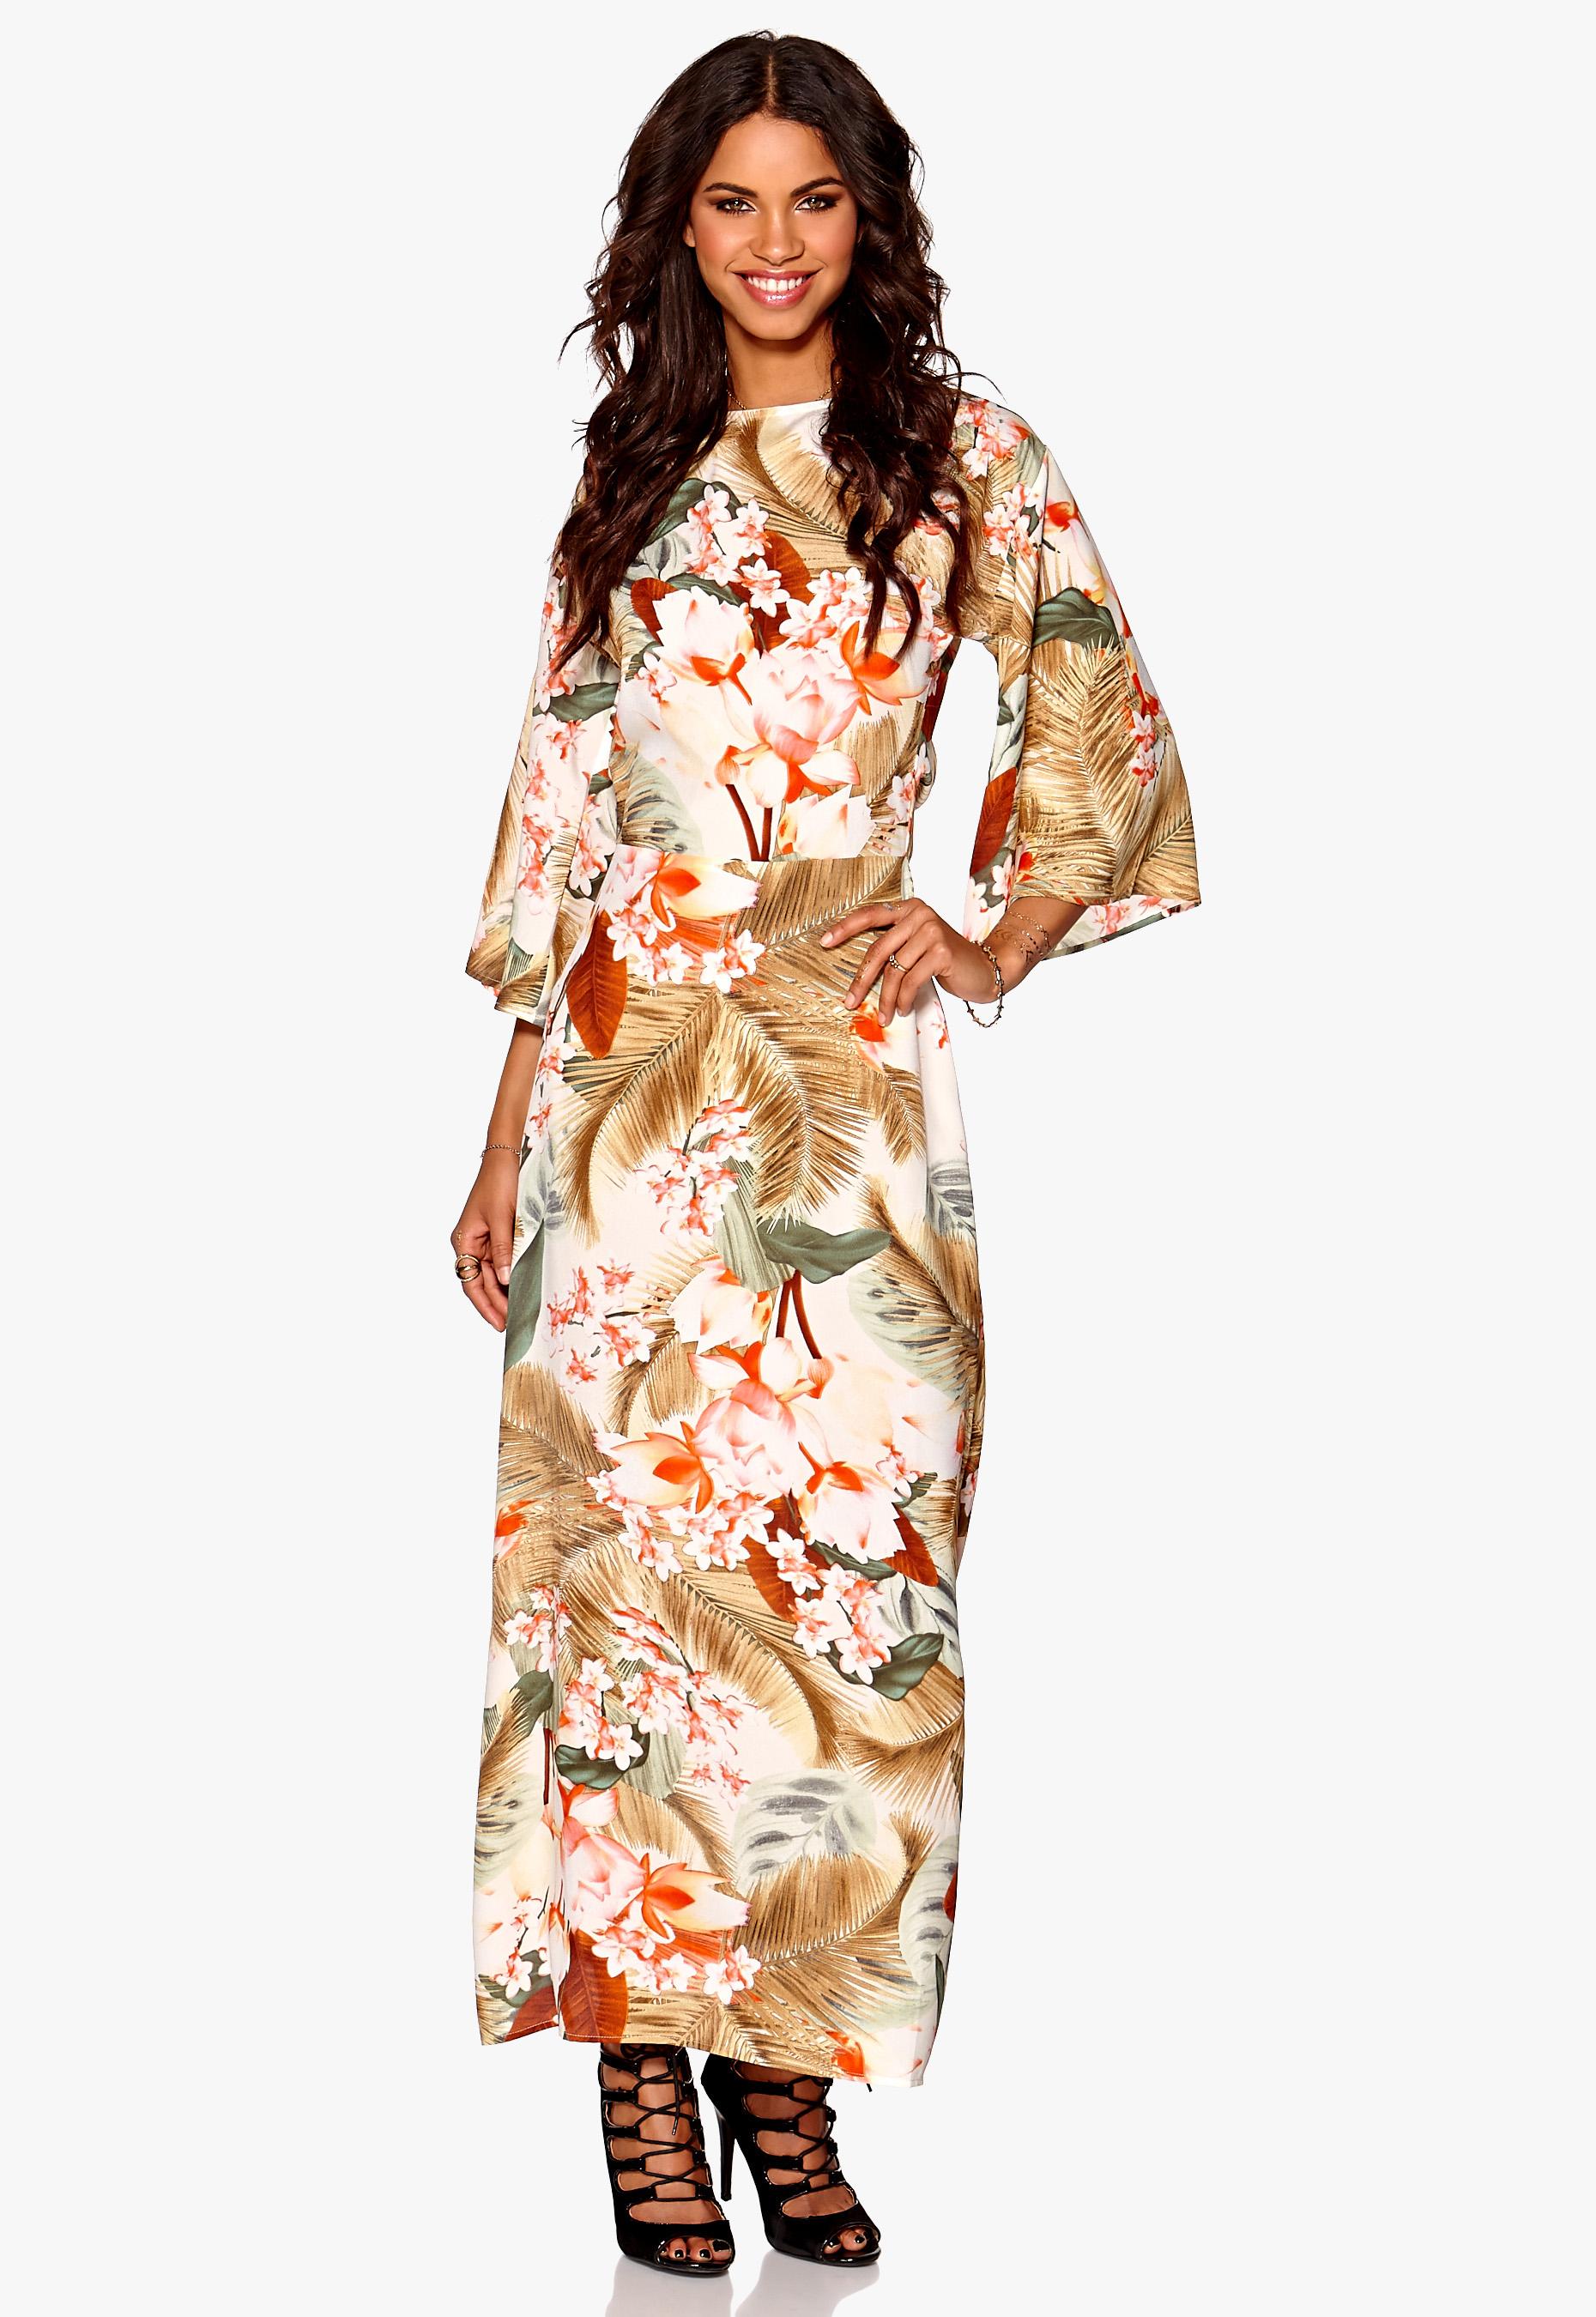 13176937dcc46 Make Way Siena Dress Offwhite / Multi / Floral - Bubbleroom